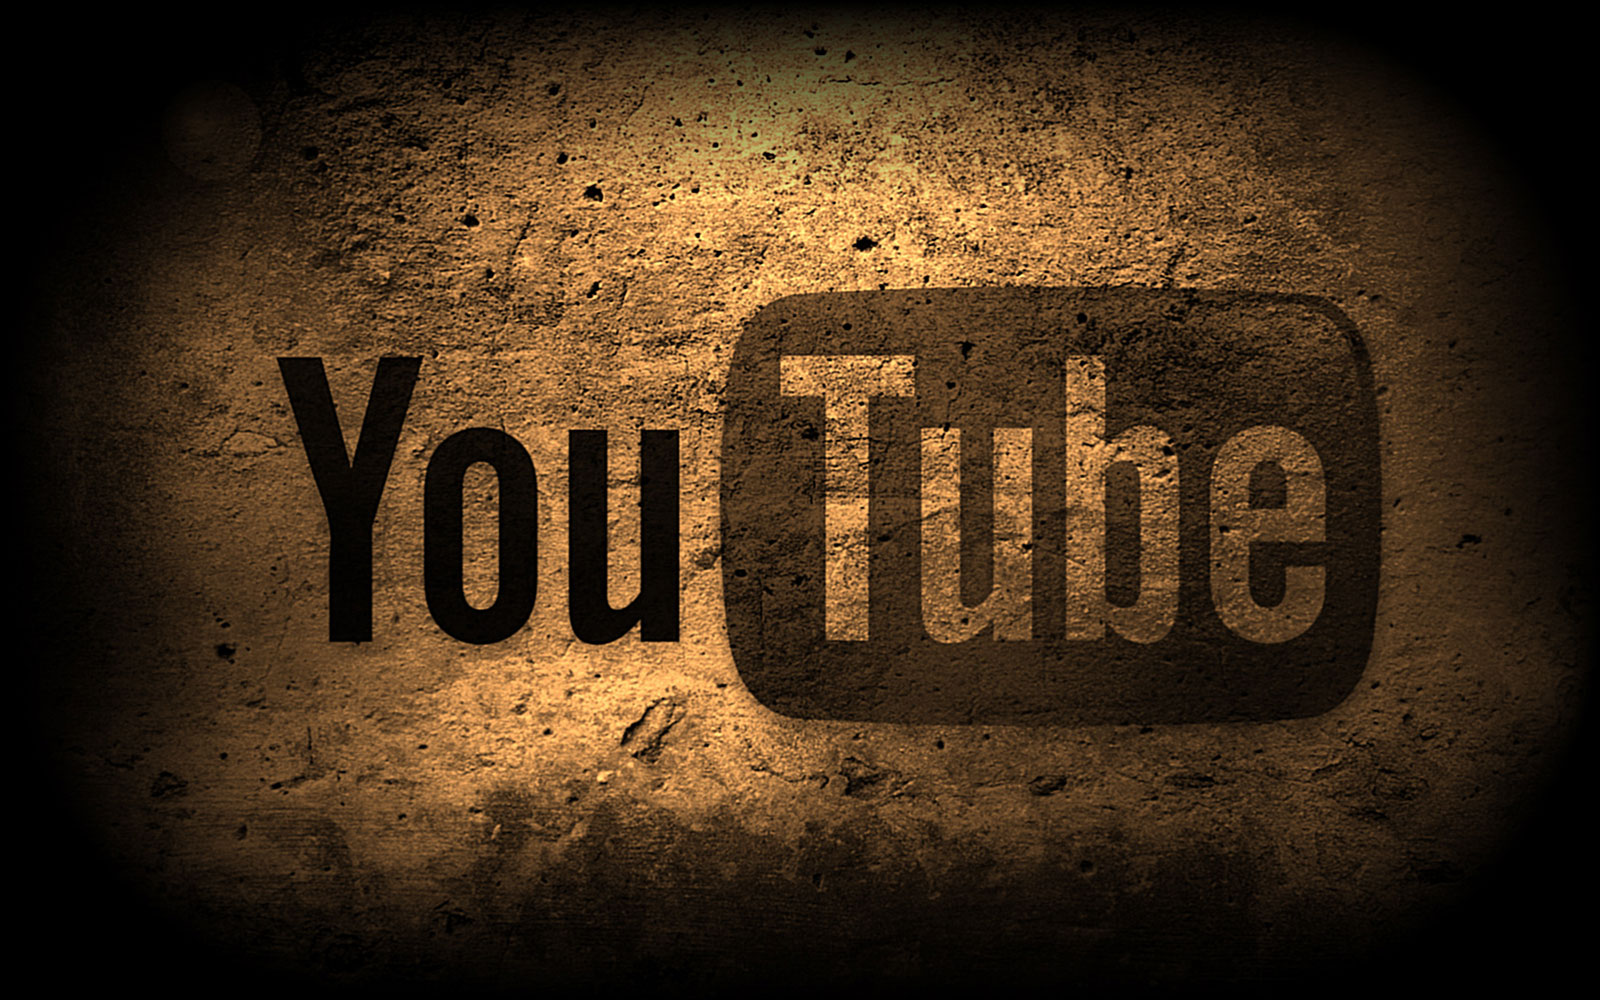 youtube-logo-widescreen-wallpaper.jpg